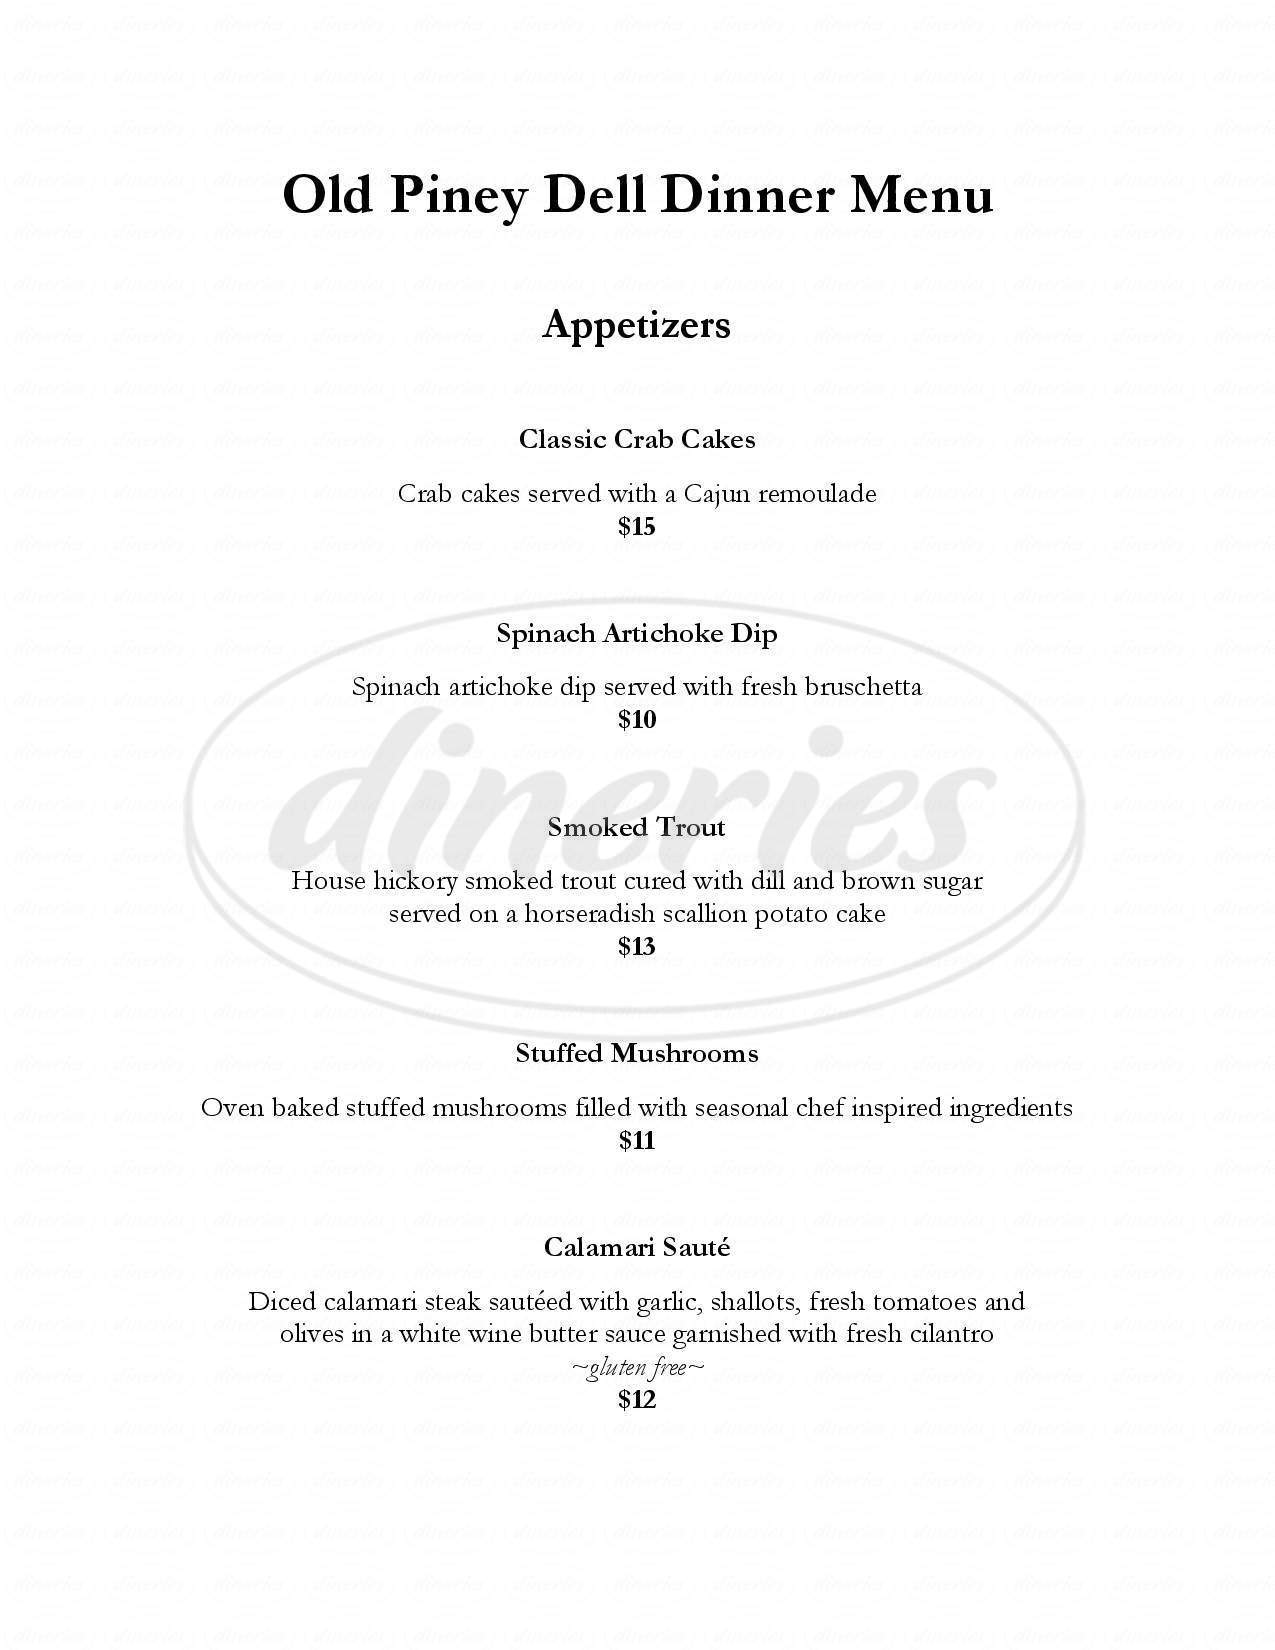 menu for Old Piney Dell Restaurant & Bar